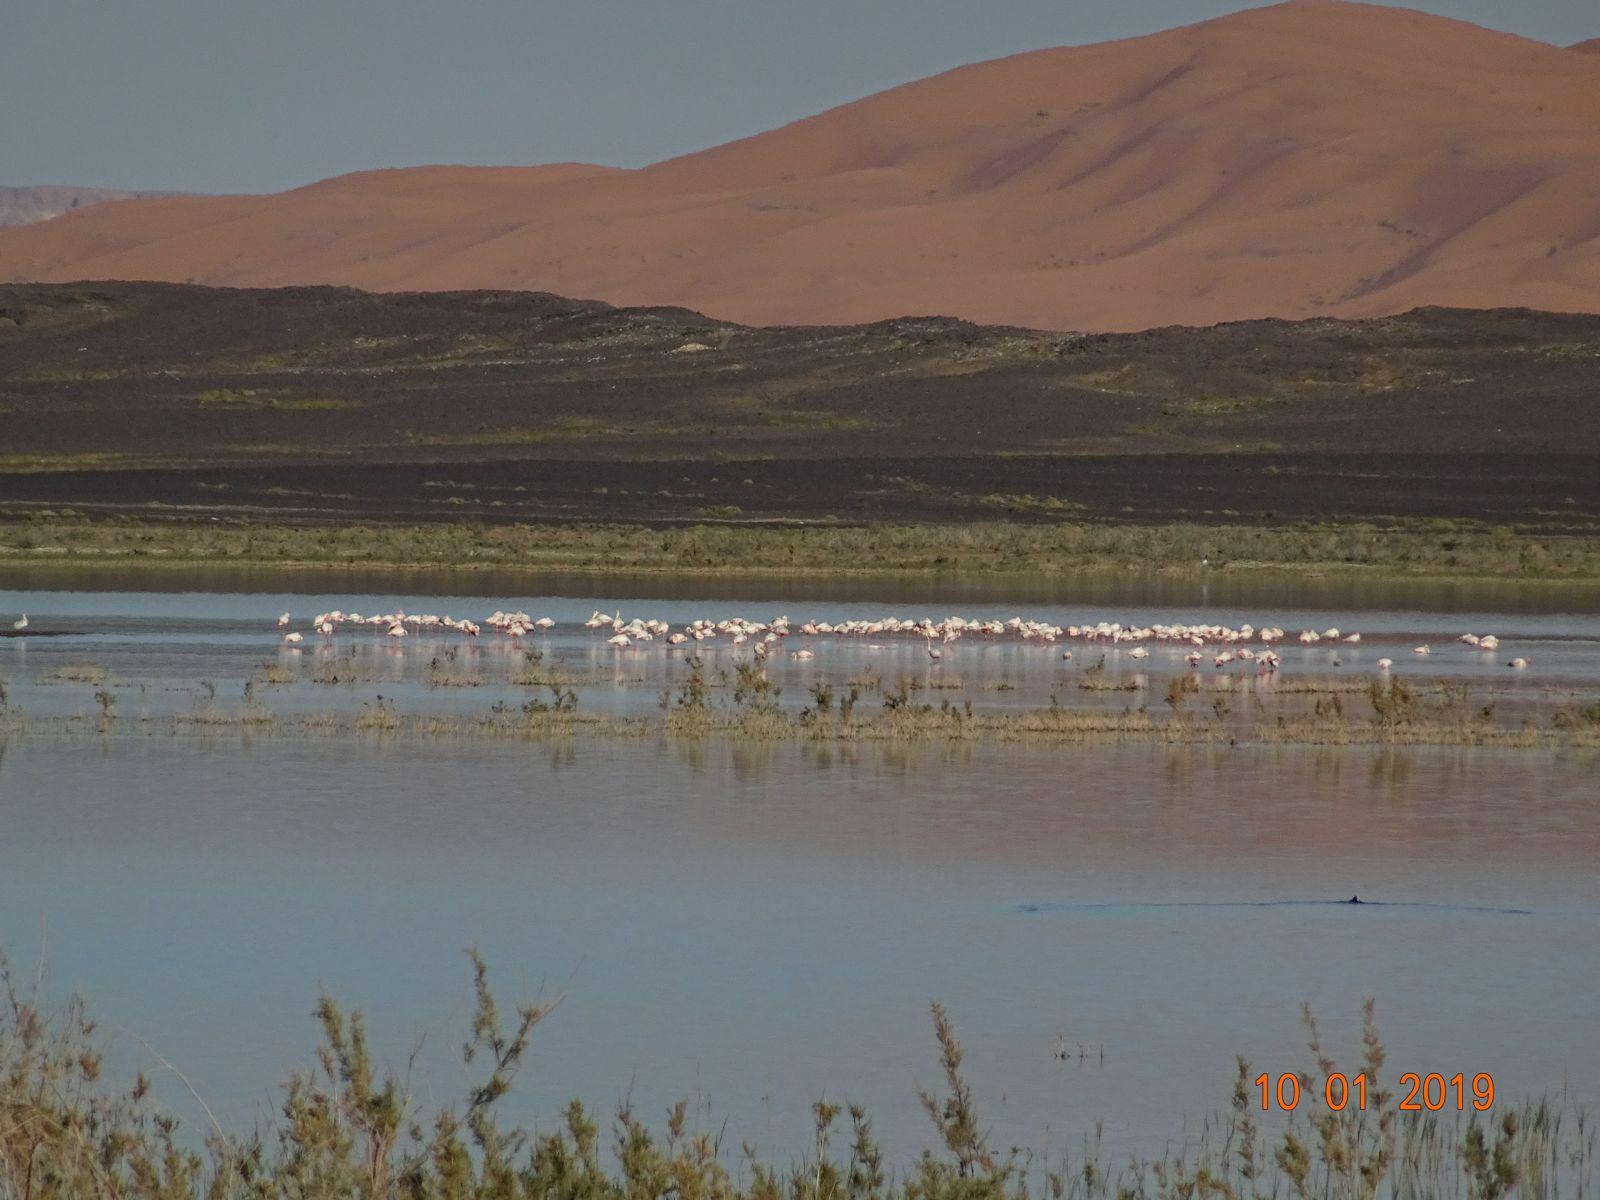 Le lac de merzouga 2